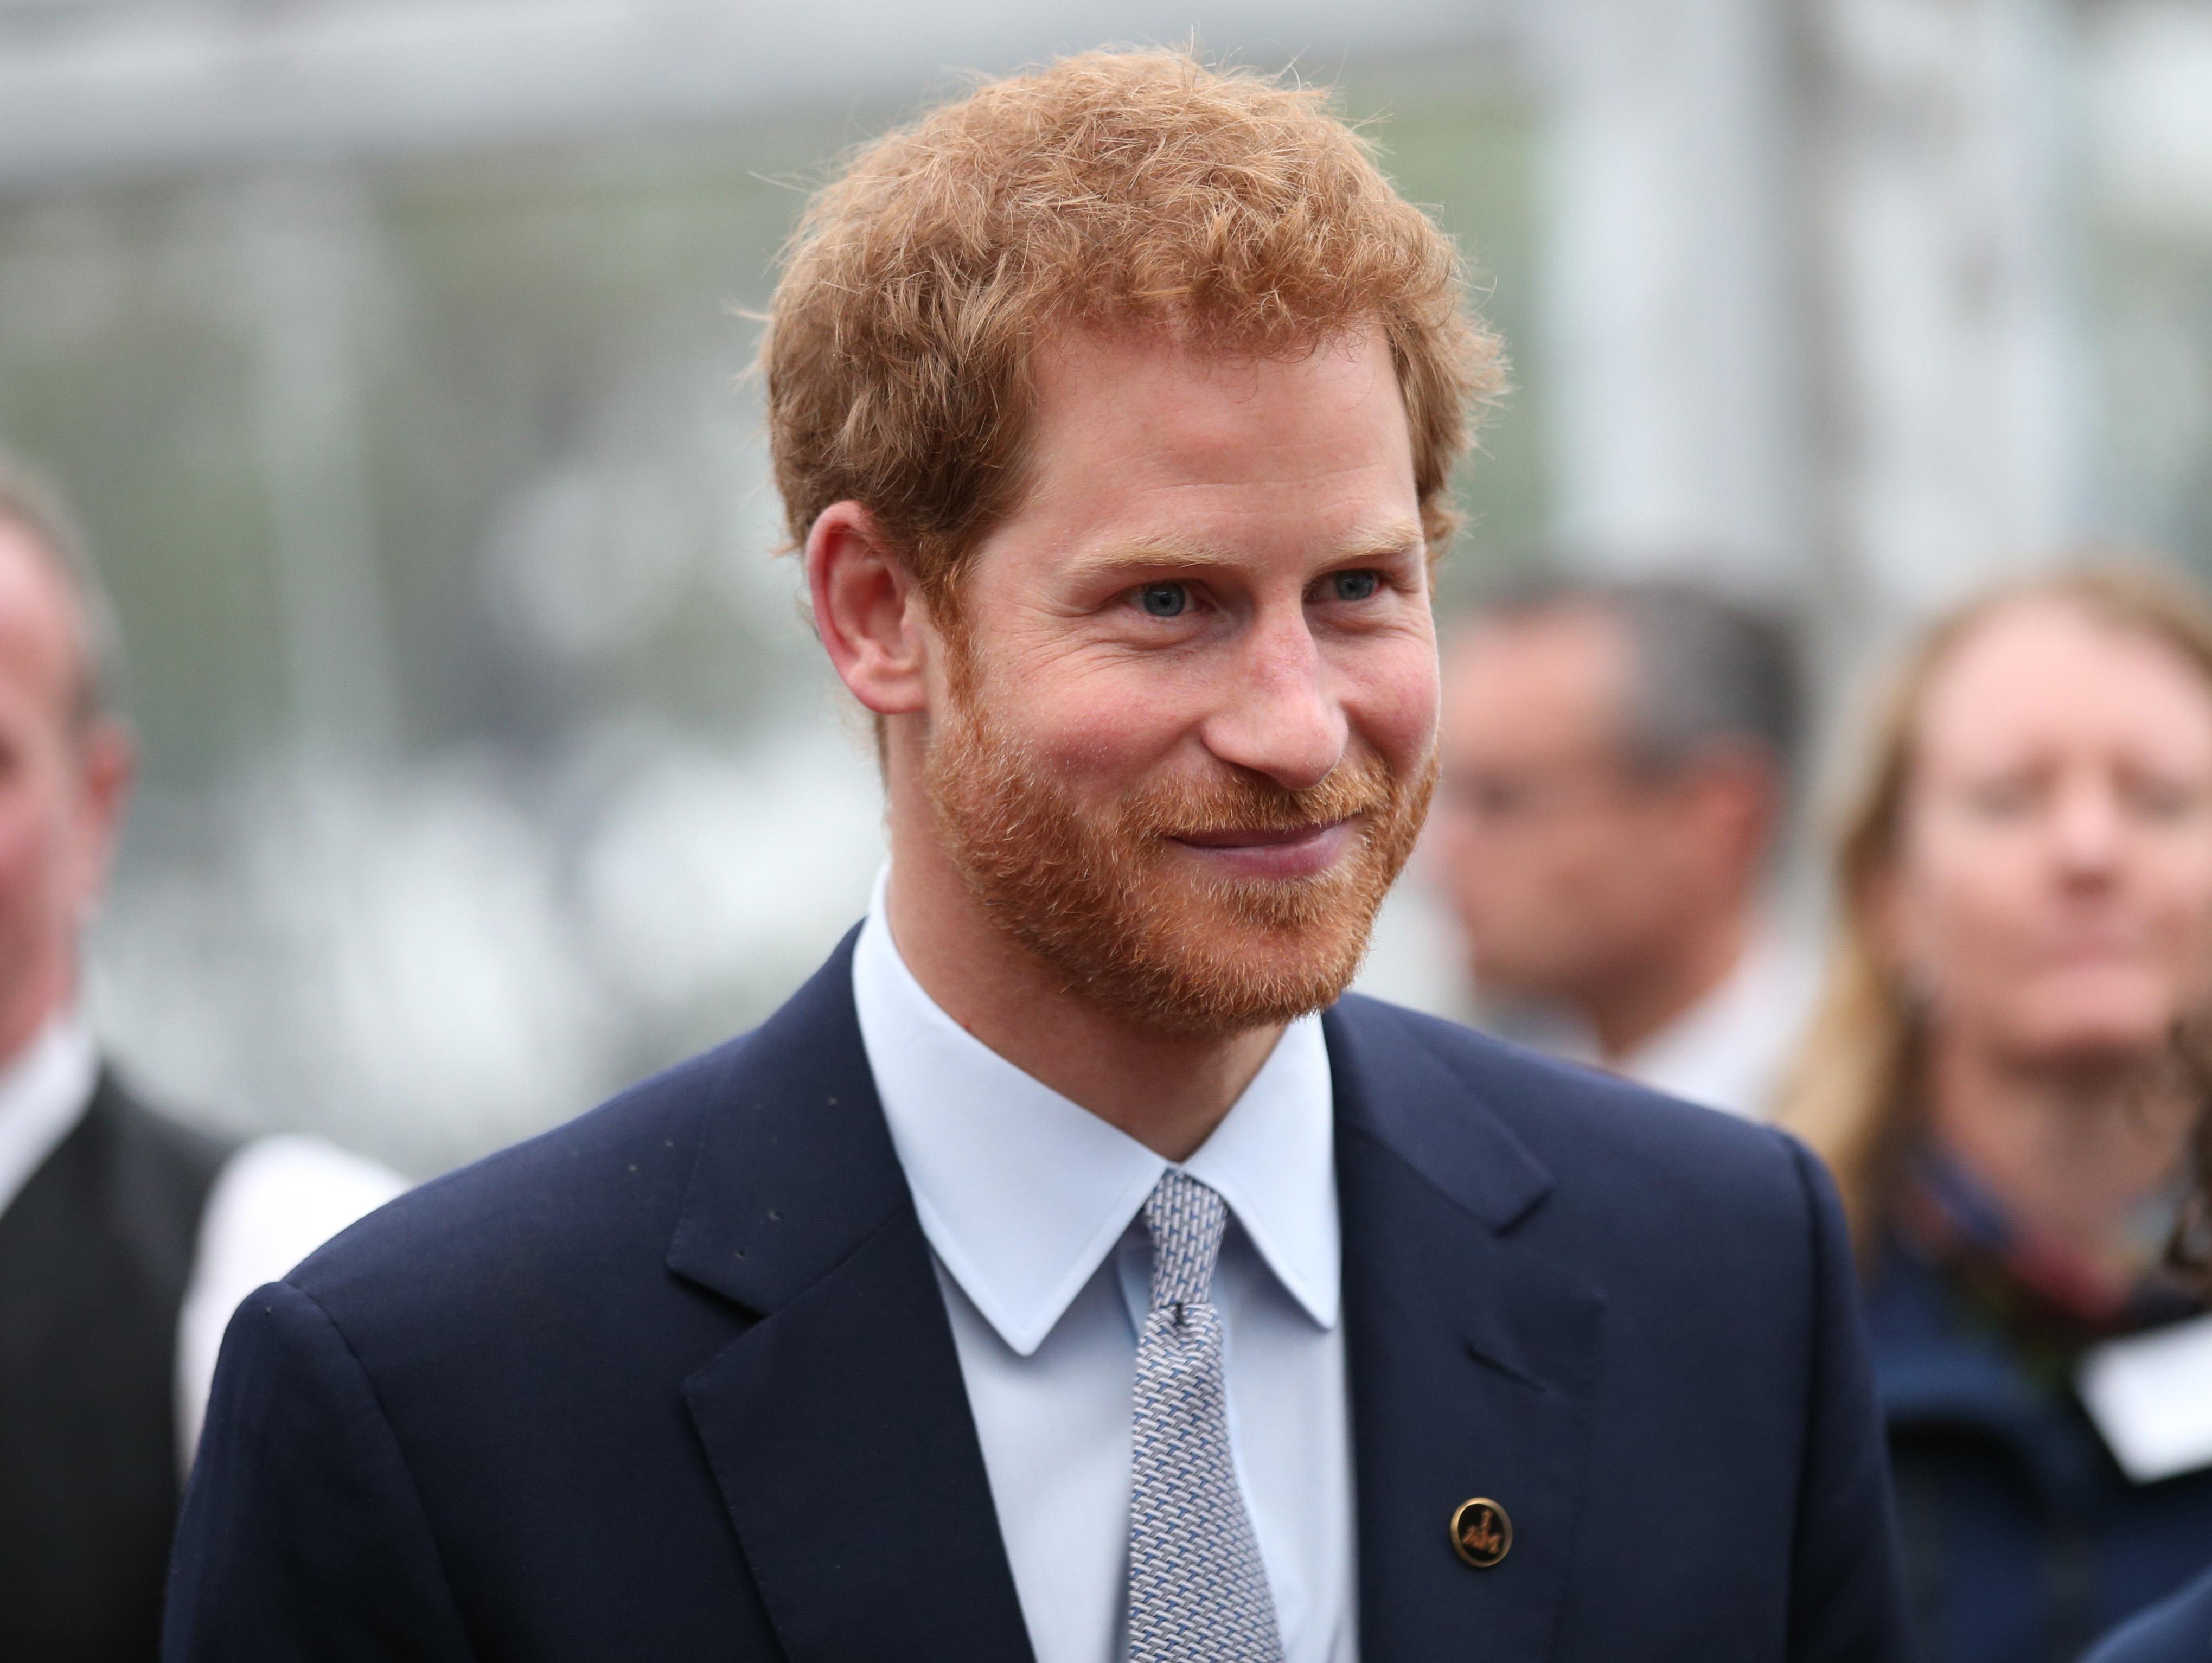 Prince Harry in Sydney, Australia, on June 7, 2017.